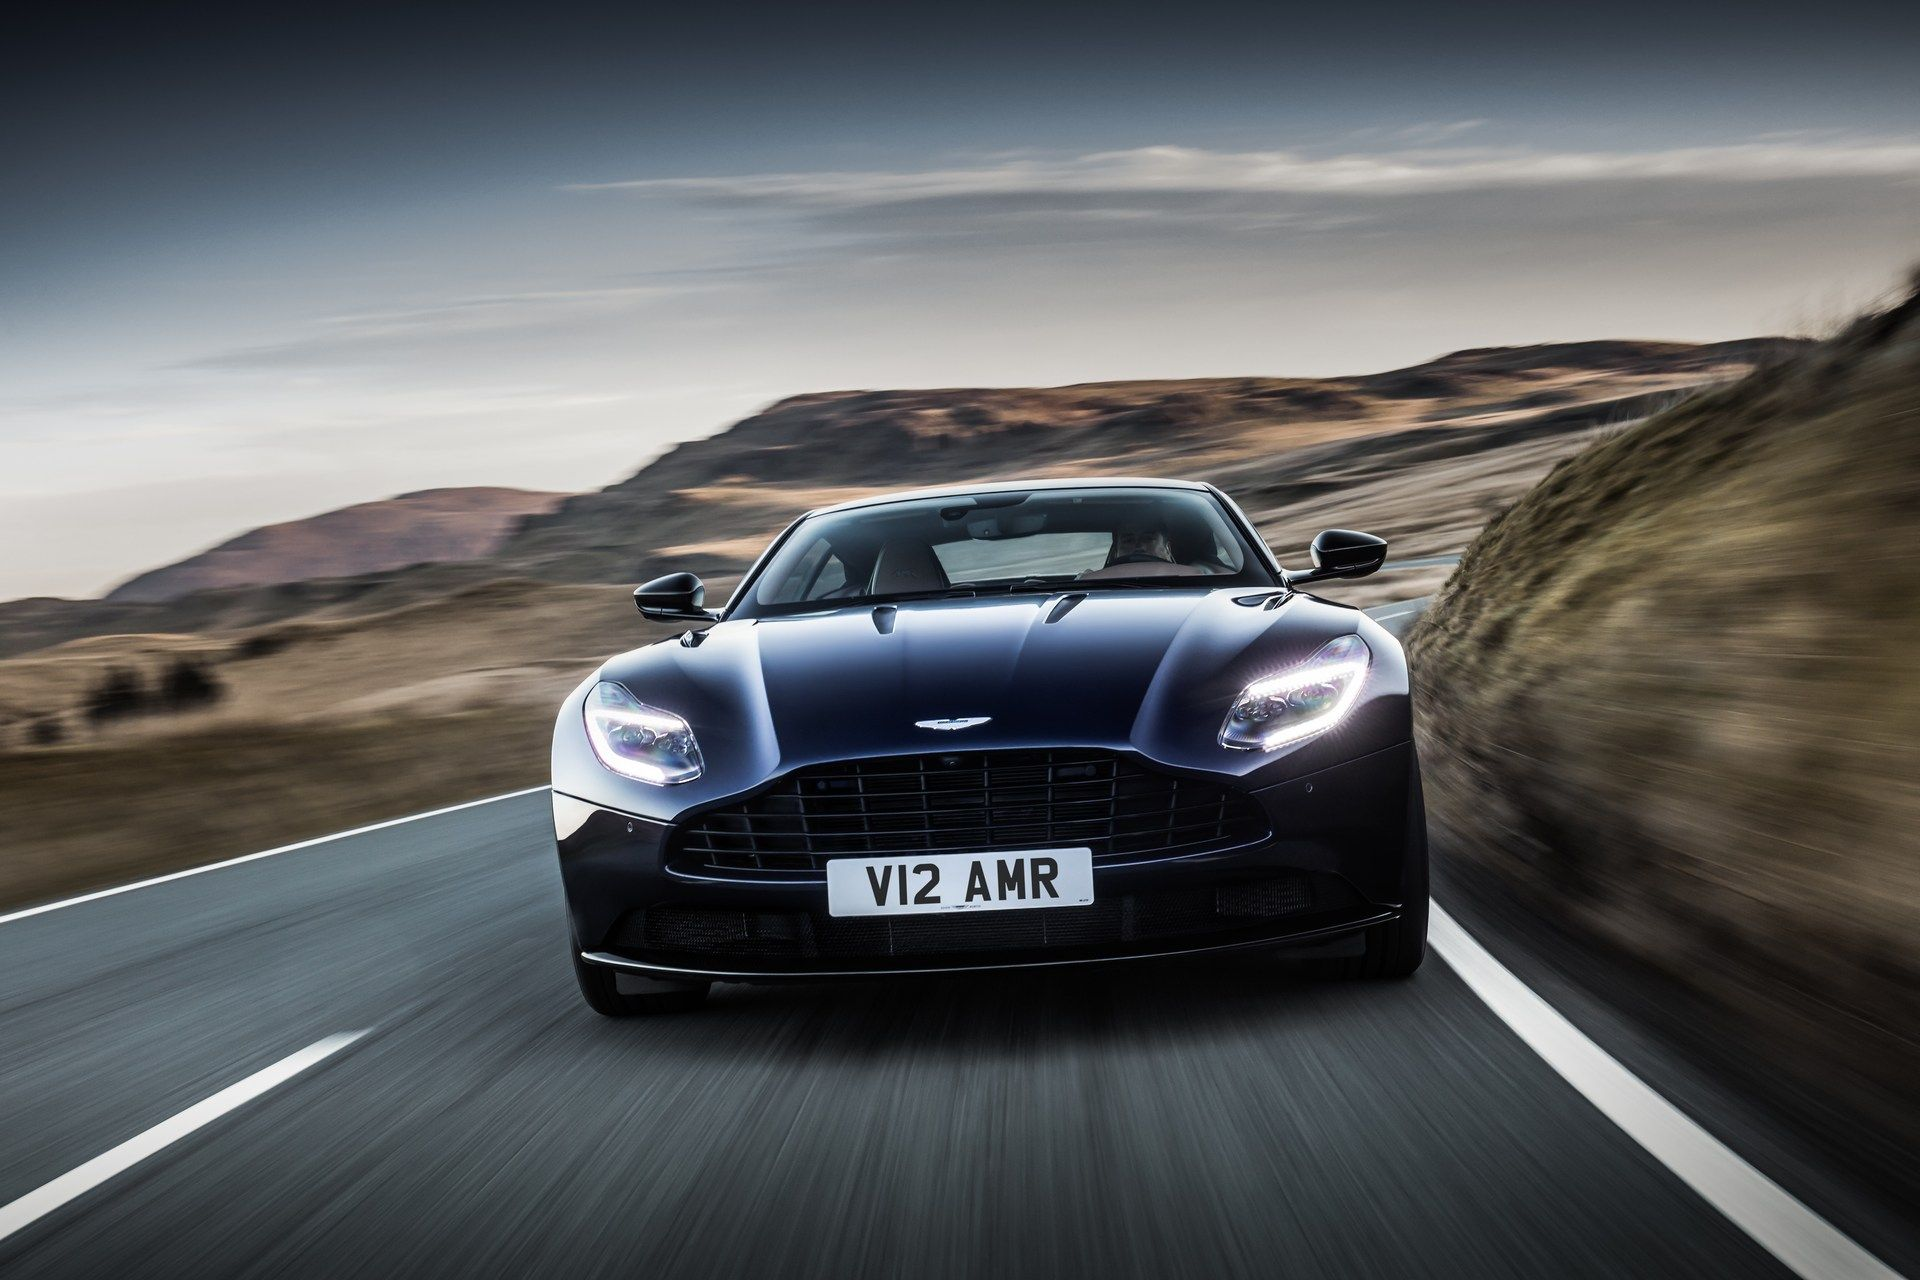 Aston-Martin-DB11-AMR-20